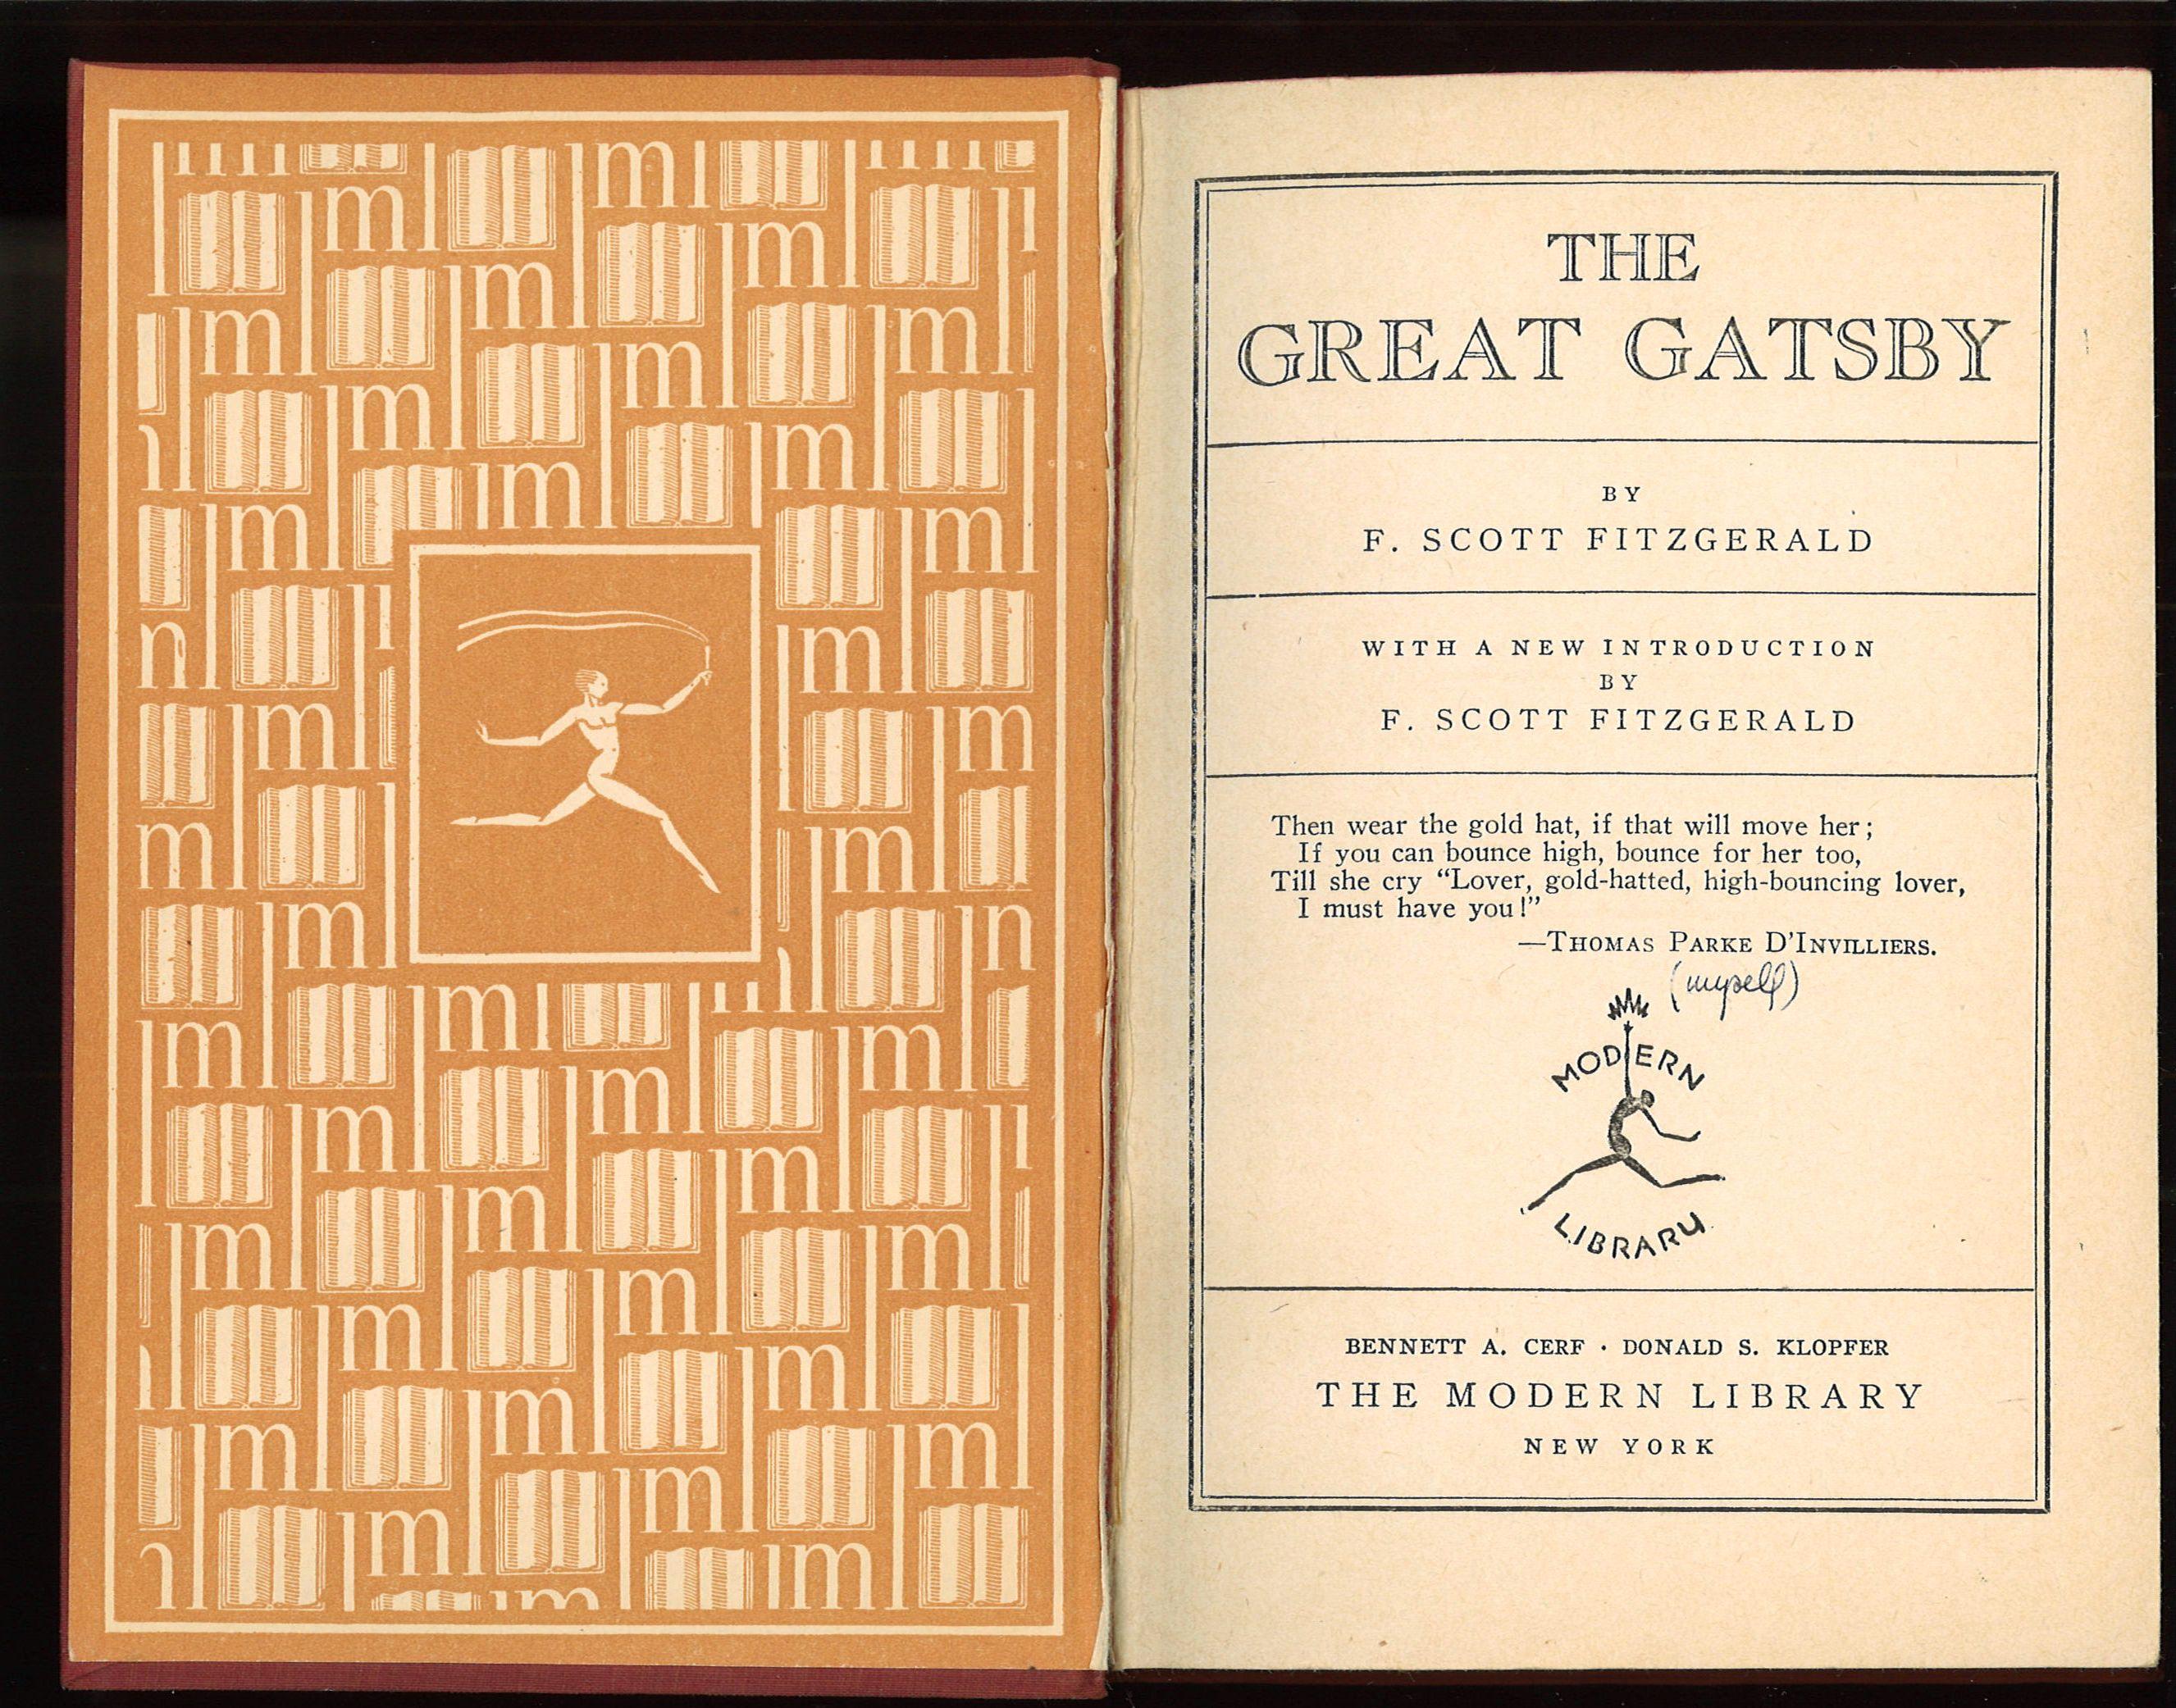 http://blogs.princeton.edu/rarebooks/images/2013.Legacy.Stewart.Trust.GG_001.jpg